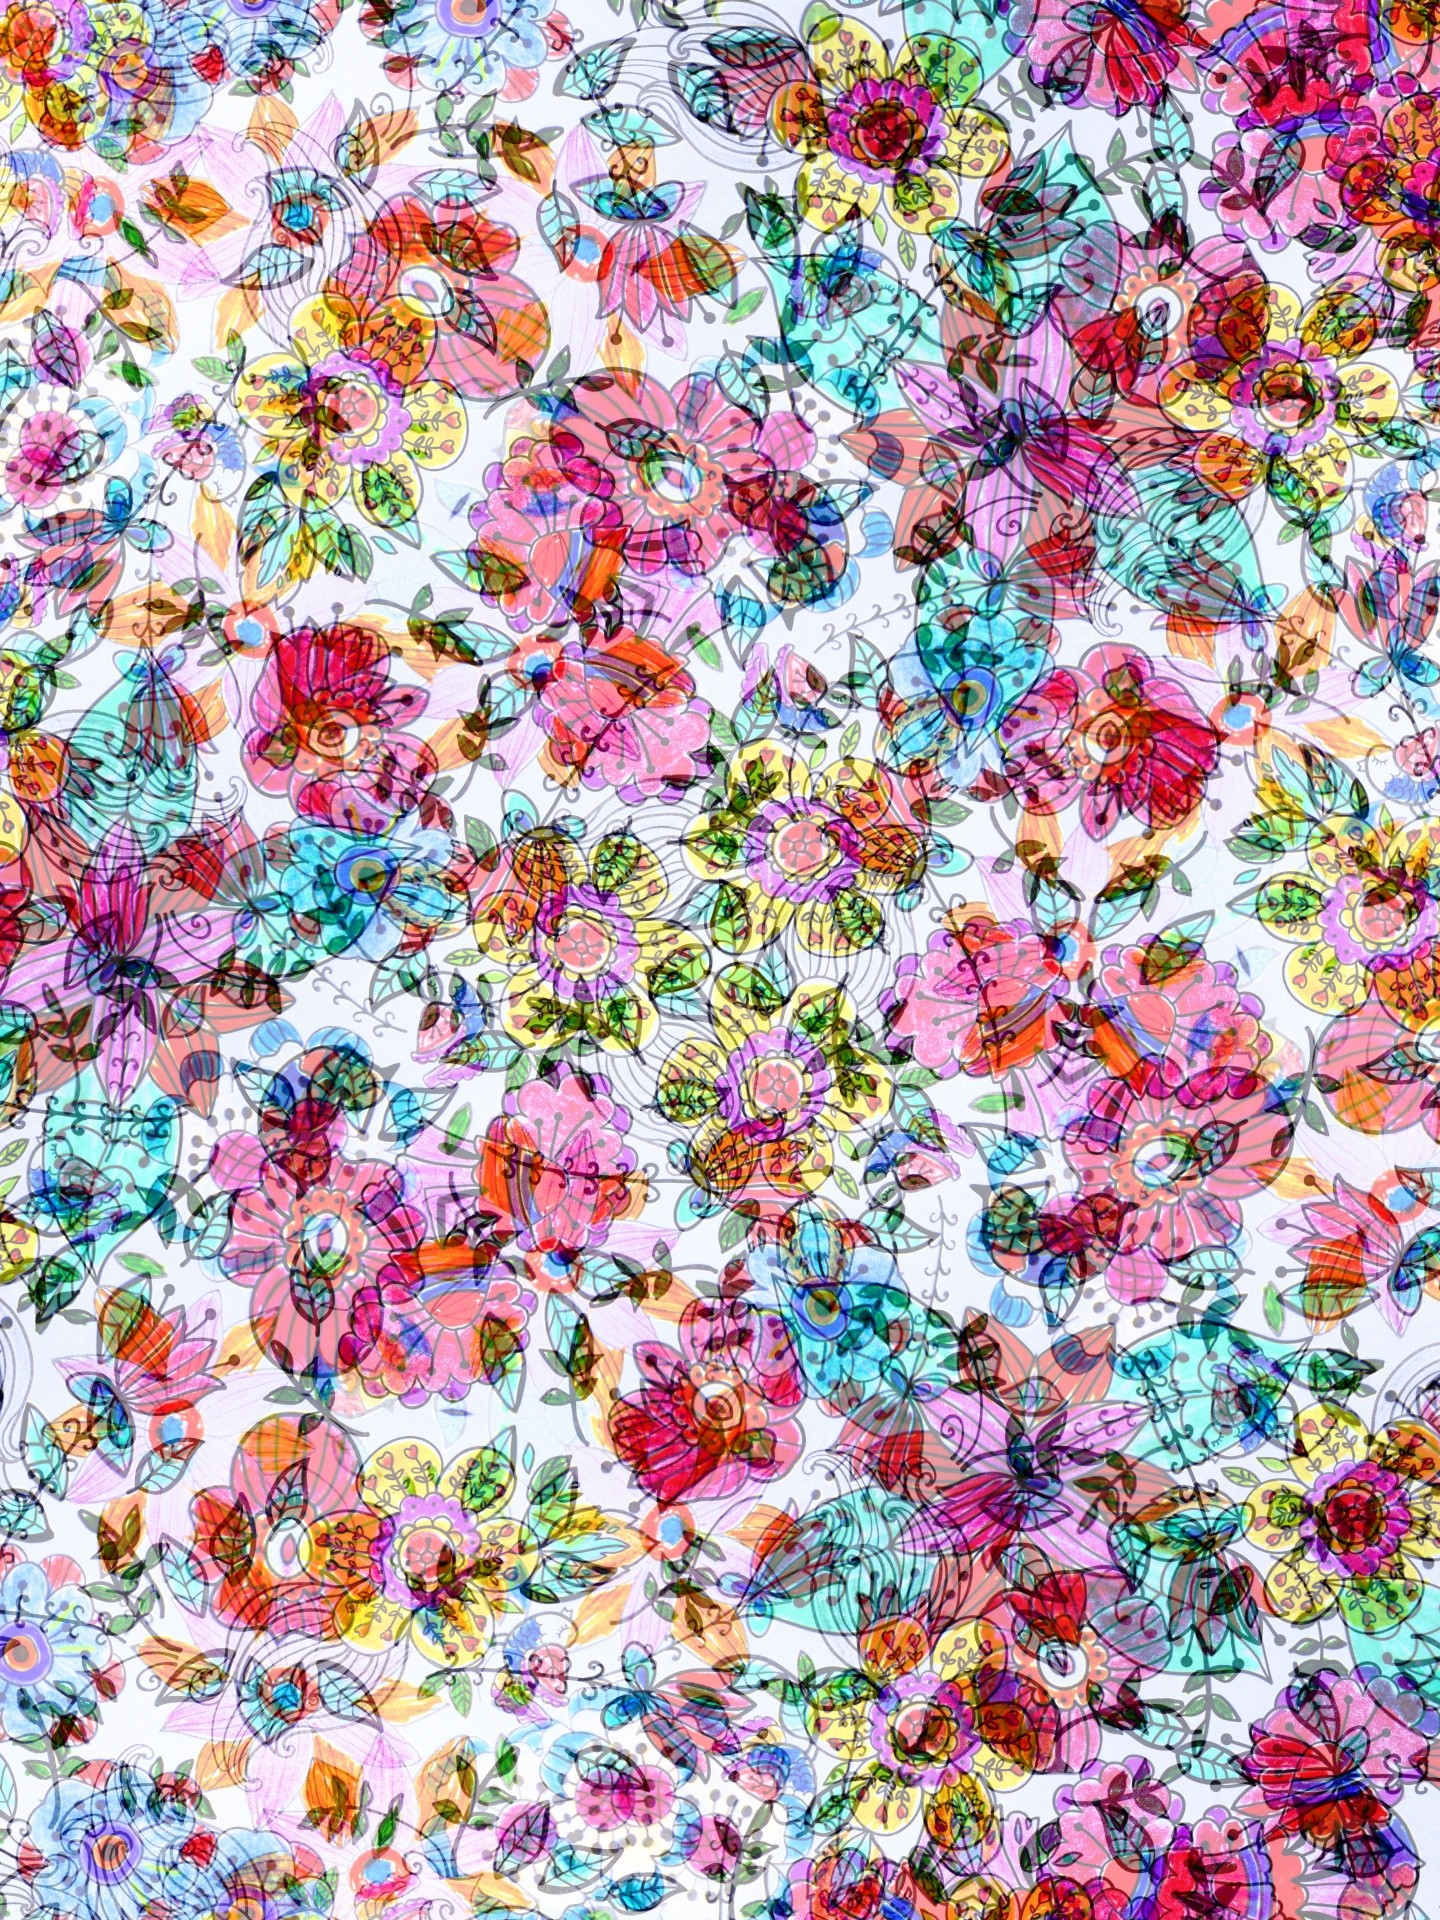 Vintage Floral wallpaper ·① Download free cool High ...